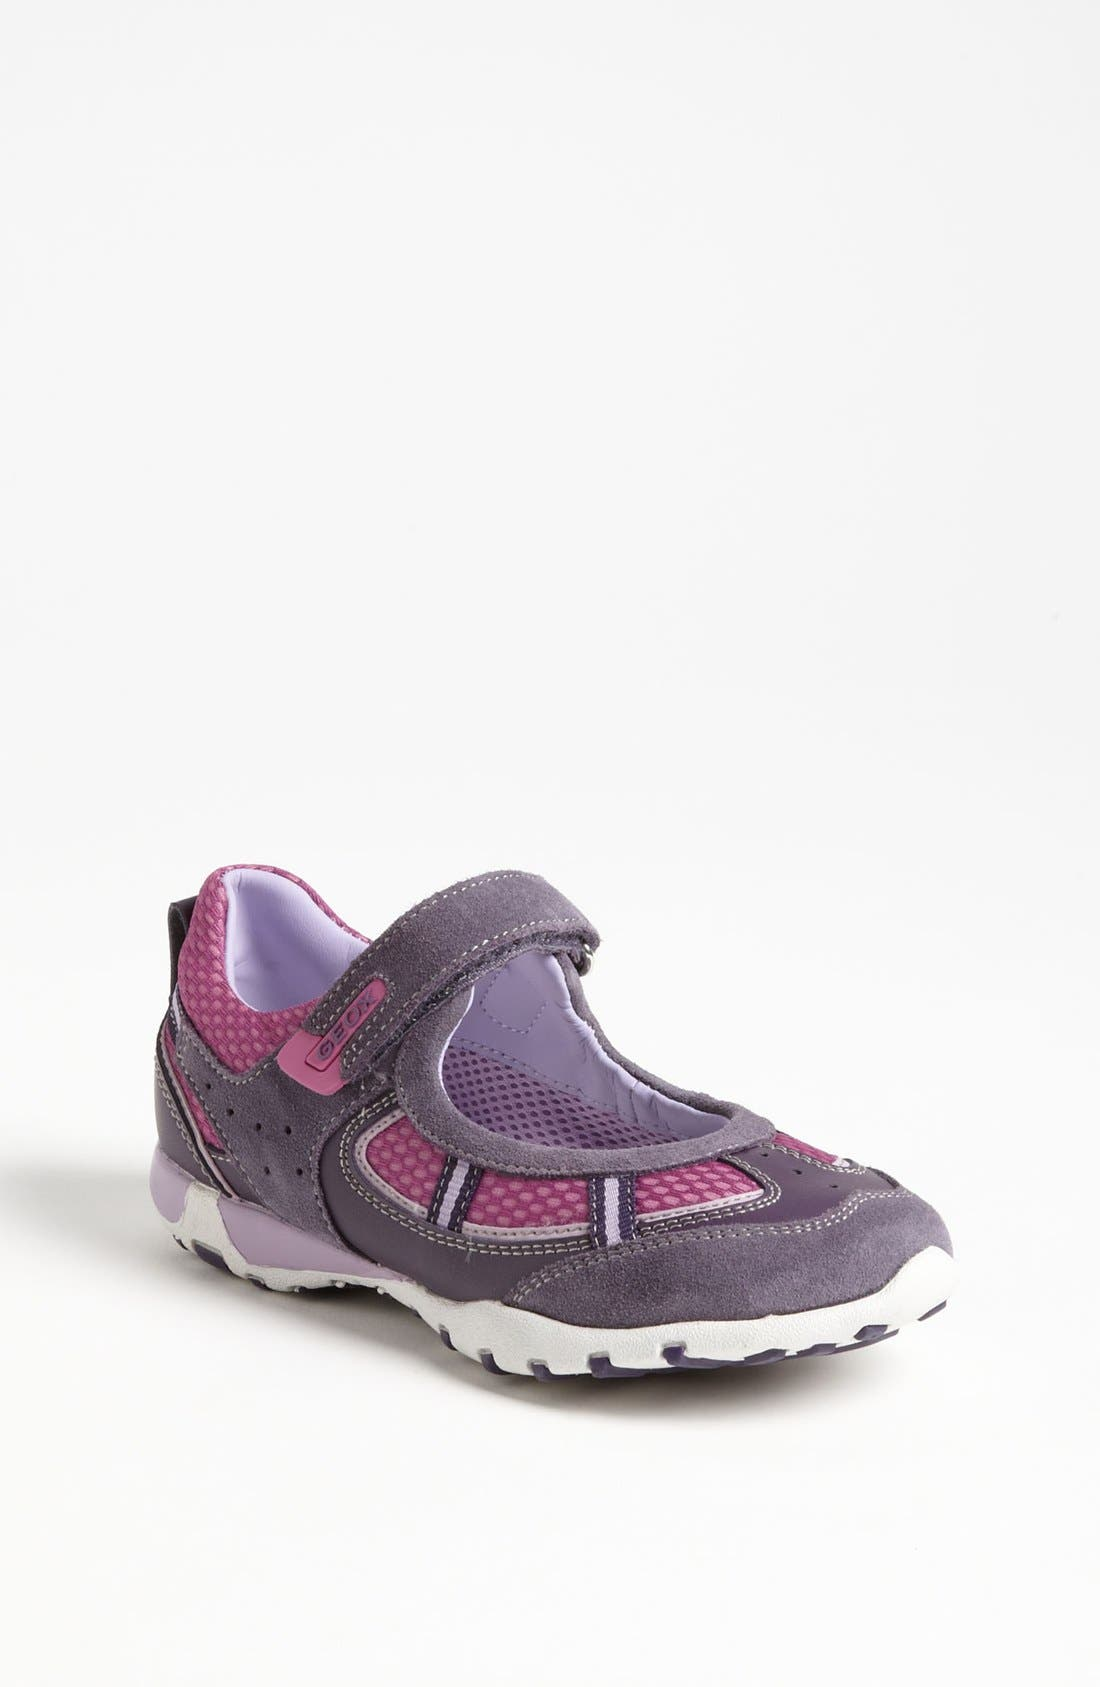 Alternate Image 1 Selected - Geox 'Freccia G' Sneaker (Toddler, Little Kid & Big Kid)